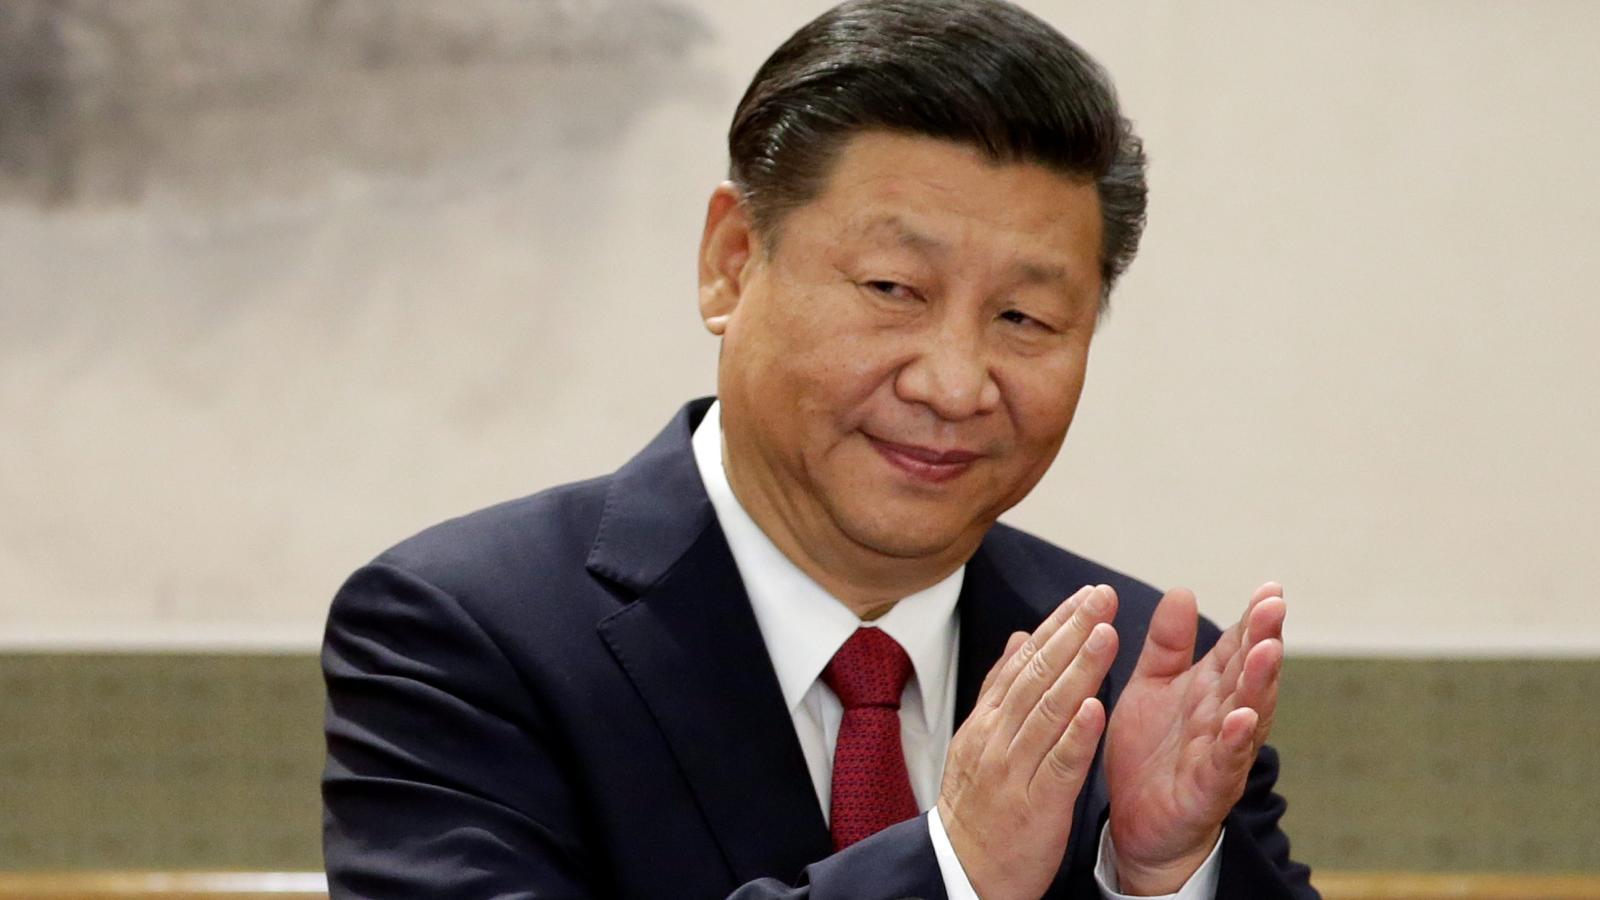 China begins construction of world's 1st commercial small modular reactor   உலகின் முதல் வணிக சிறிய அணு உலை கட்டுமானத்தை சீனா தொடங்குகிறது  _40.1